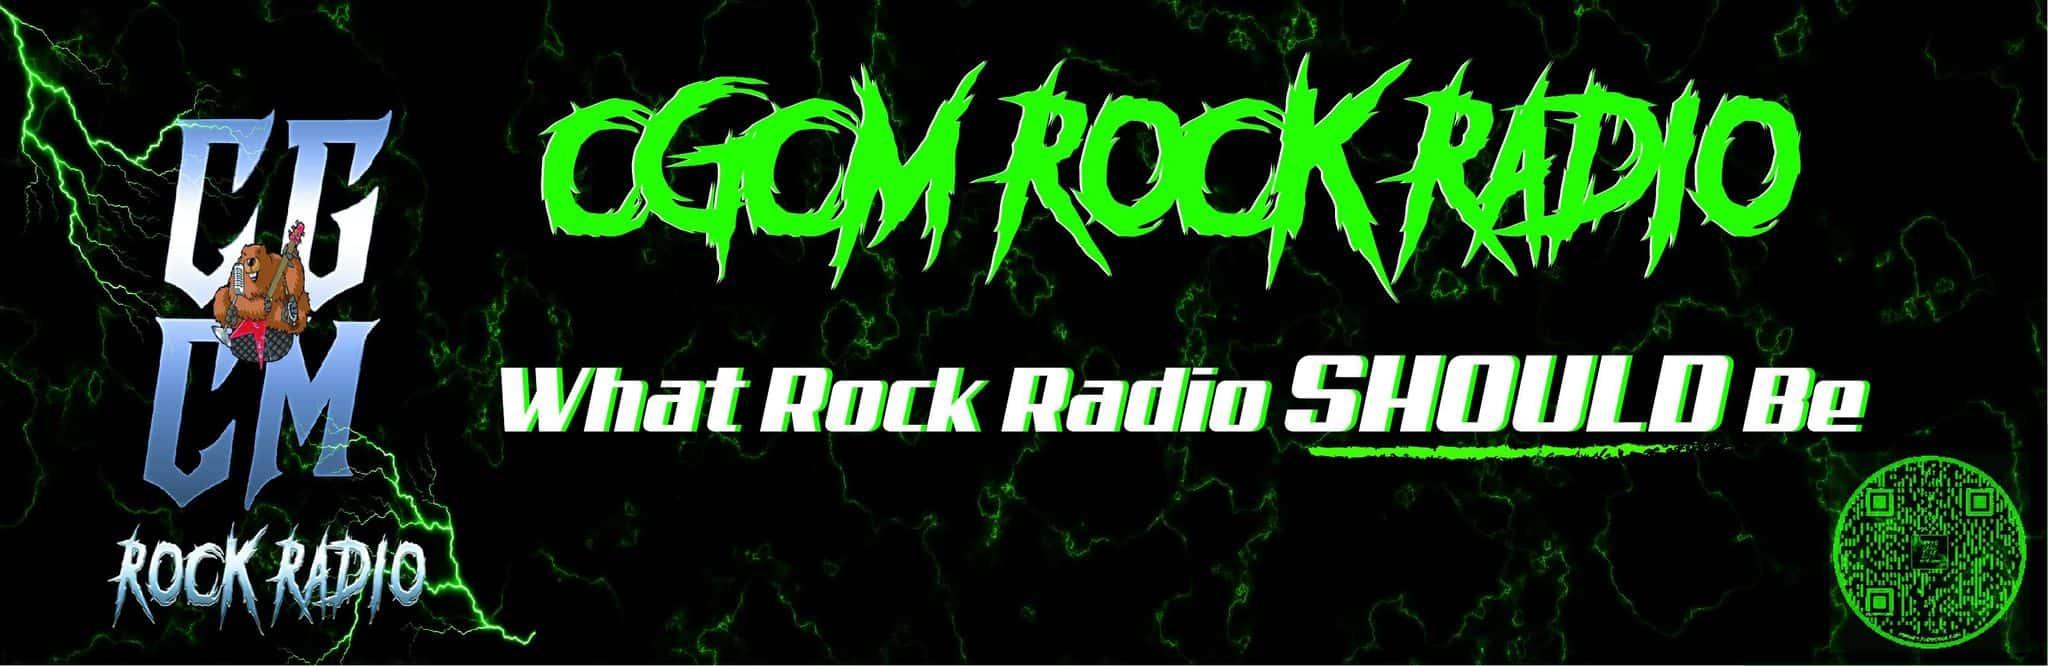 CGCM Rock Radio